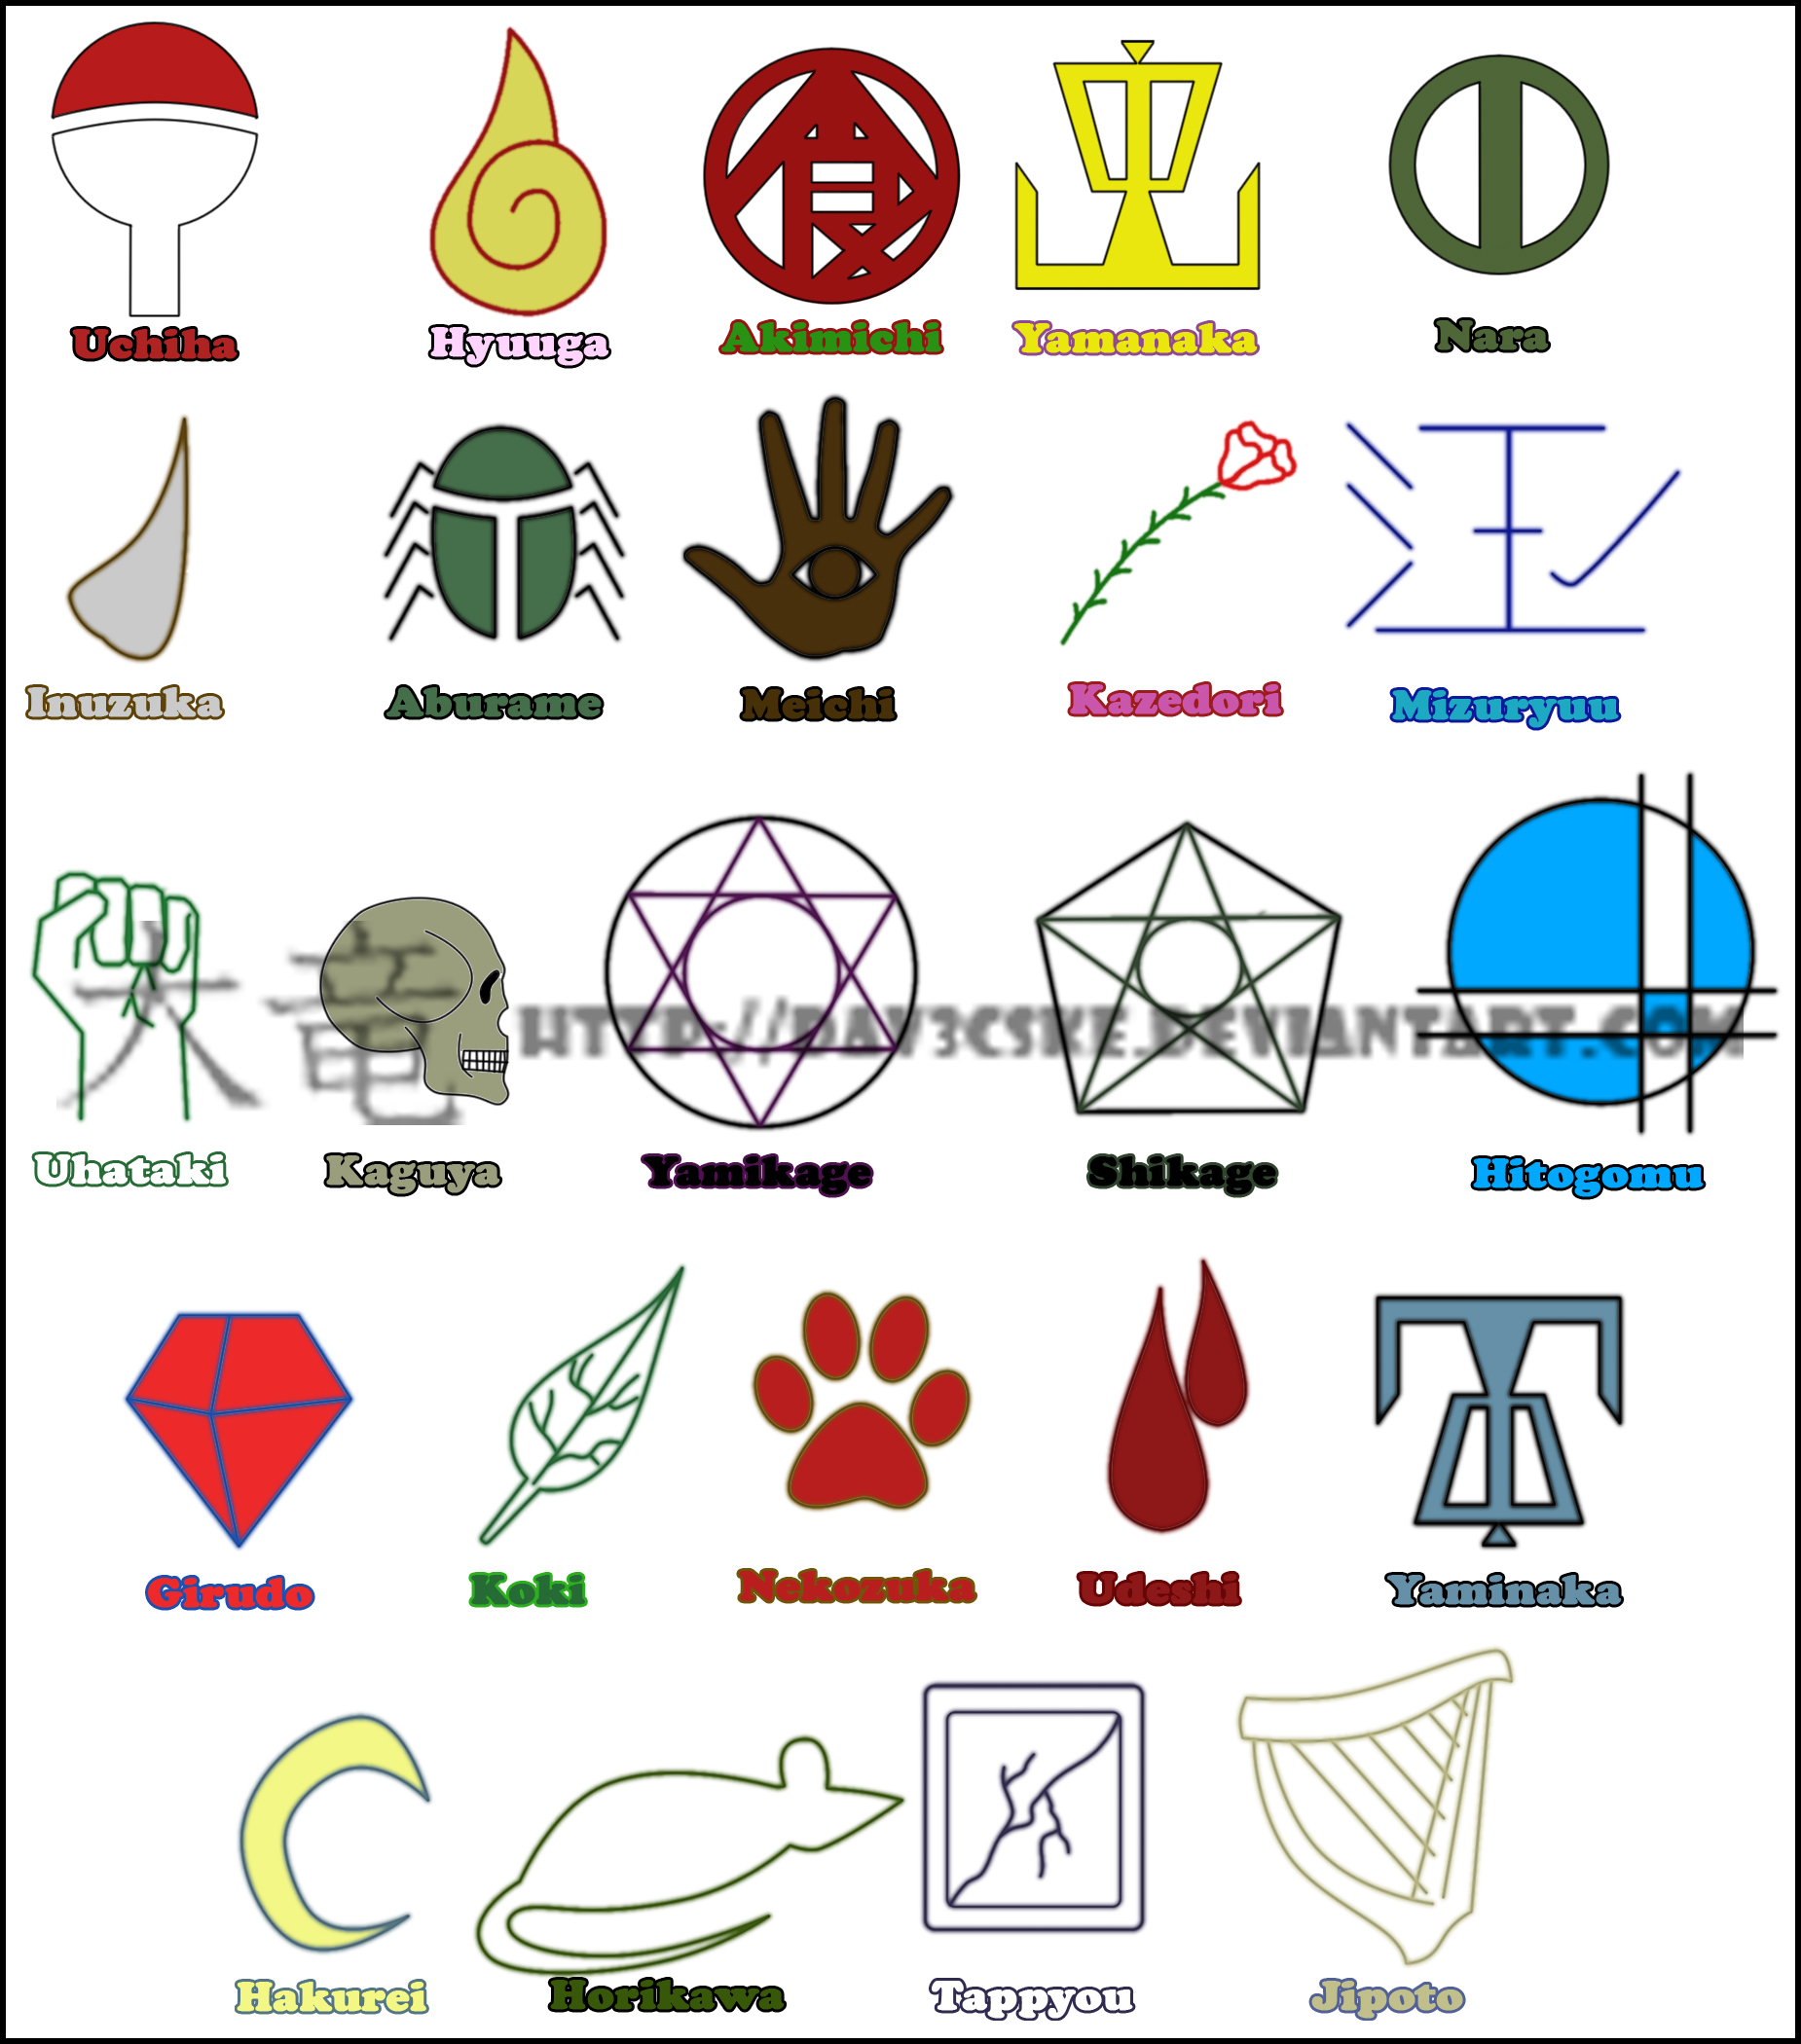 Japanese kanji symbols by mist of niflheim on deviantart clan symbols by dav3cske biocorpaavc Image collections